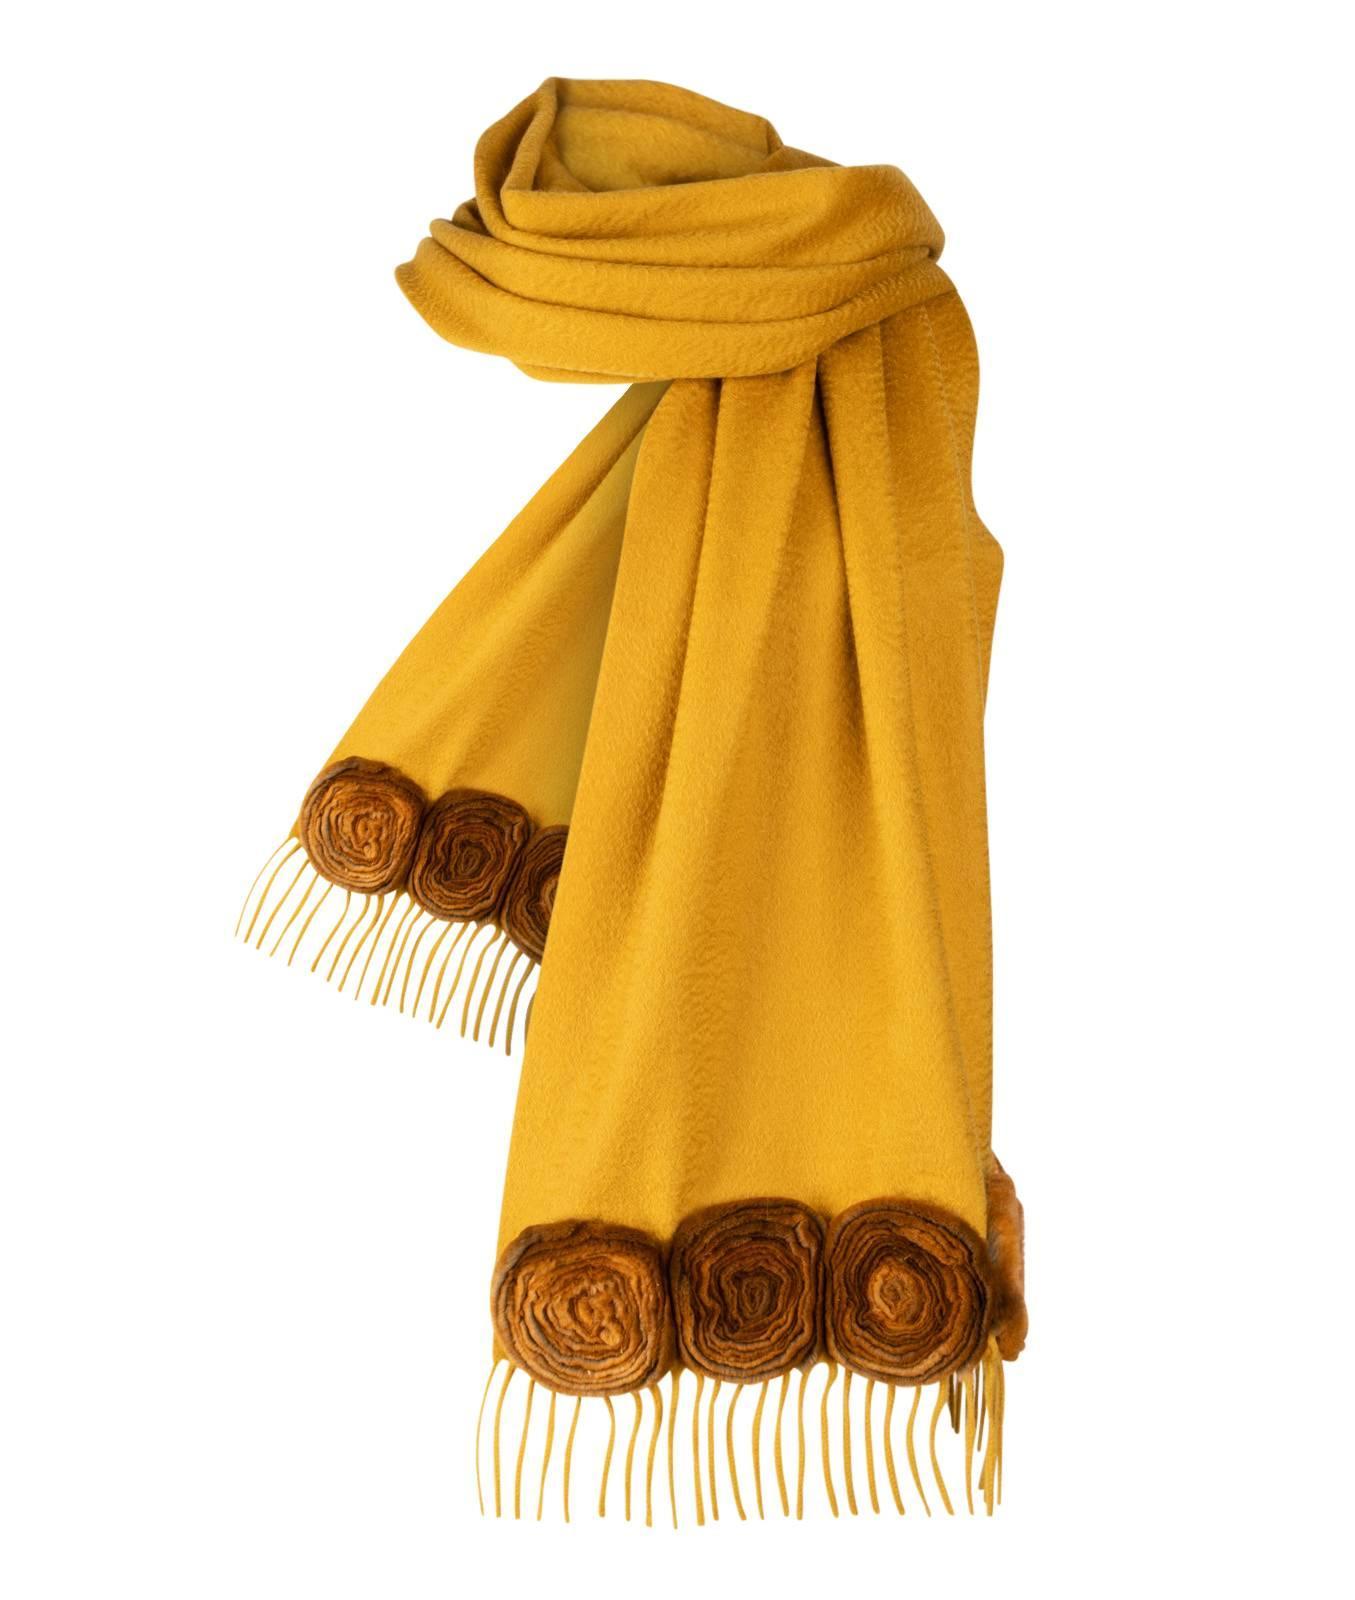 H3-01 Fuchsia Feather Plume Lady Women Shawl Wrap Chiffon Scarf